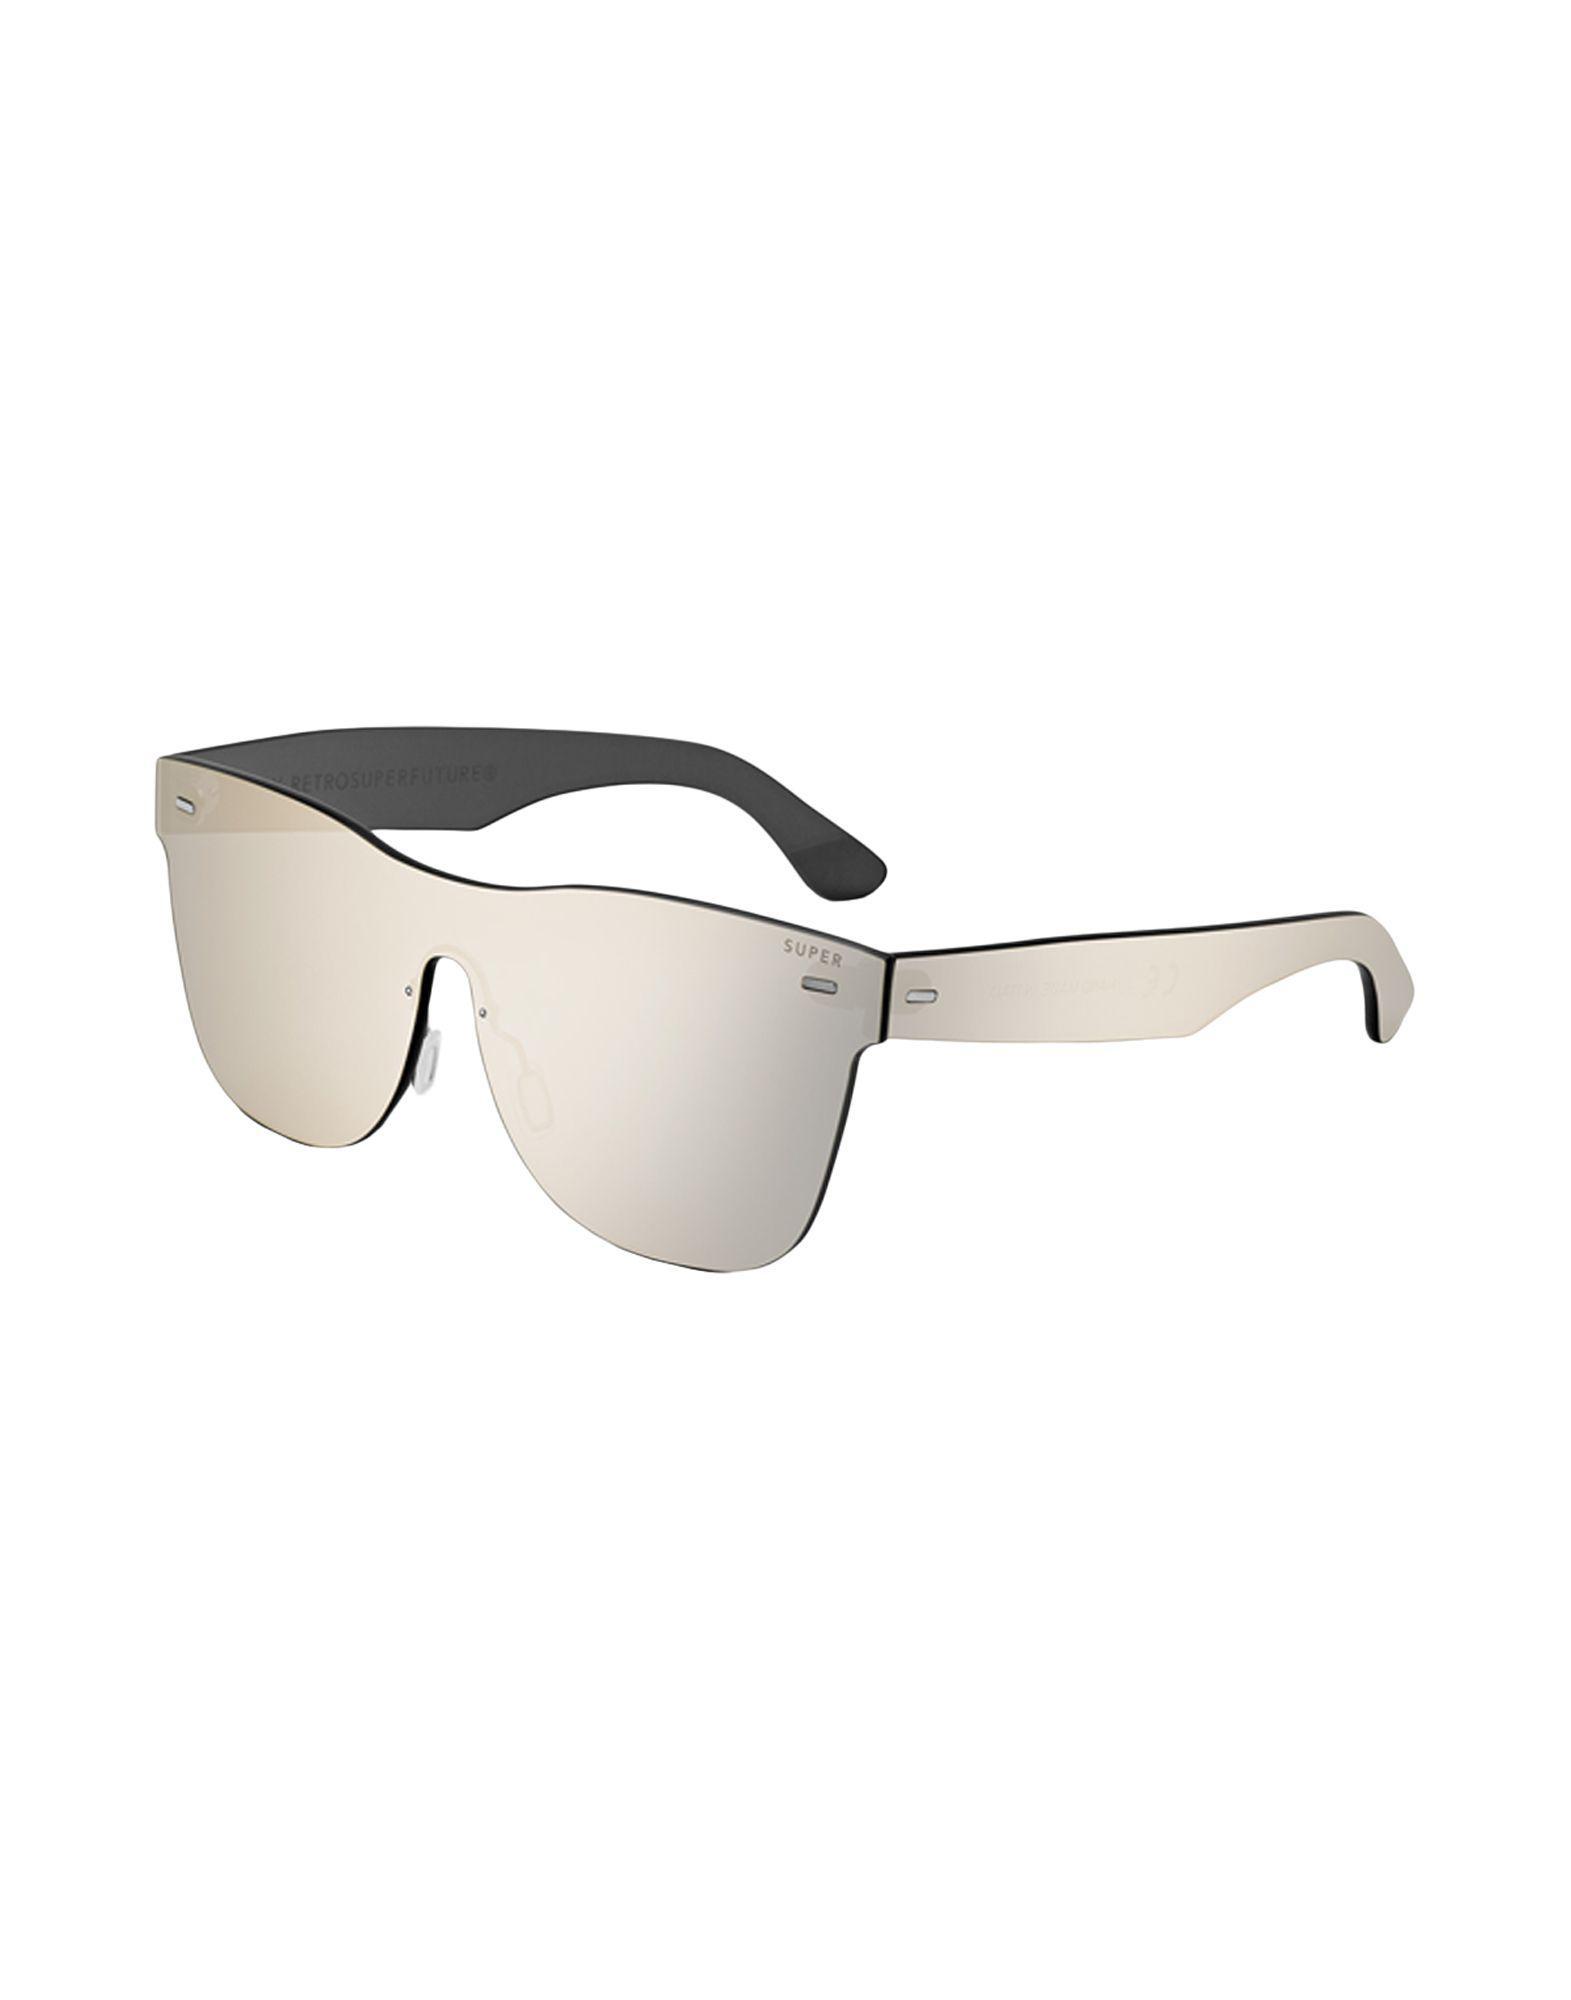 65e9fadc4982 Retrosuperfuture - White Sunglasses for Men - Lyst. View fullscreen